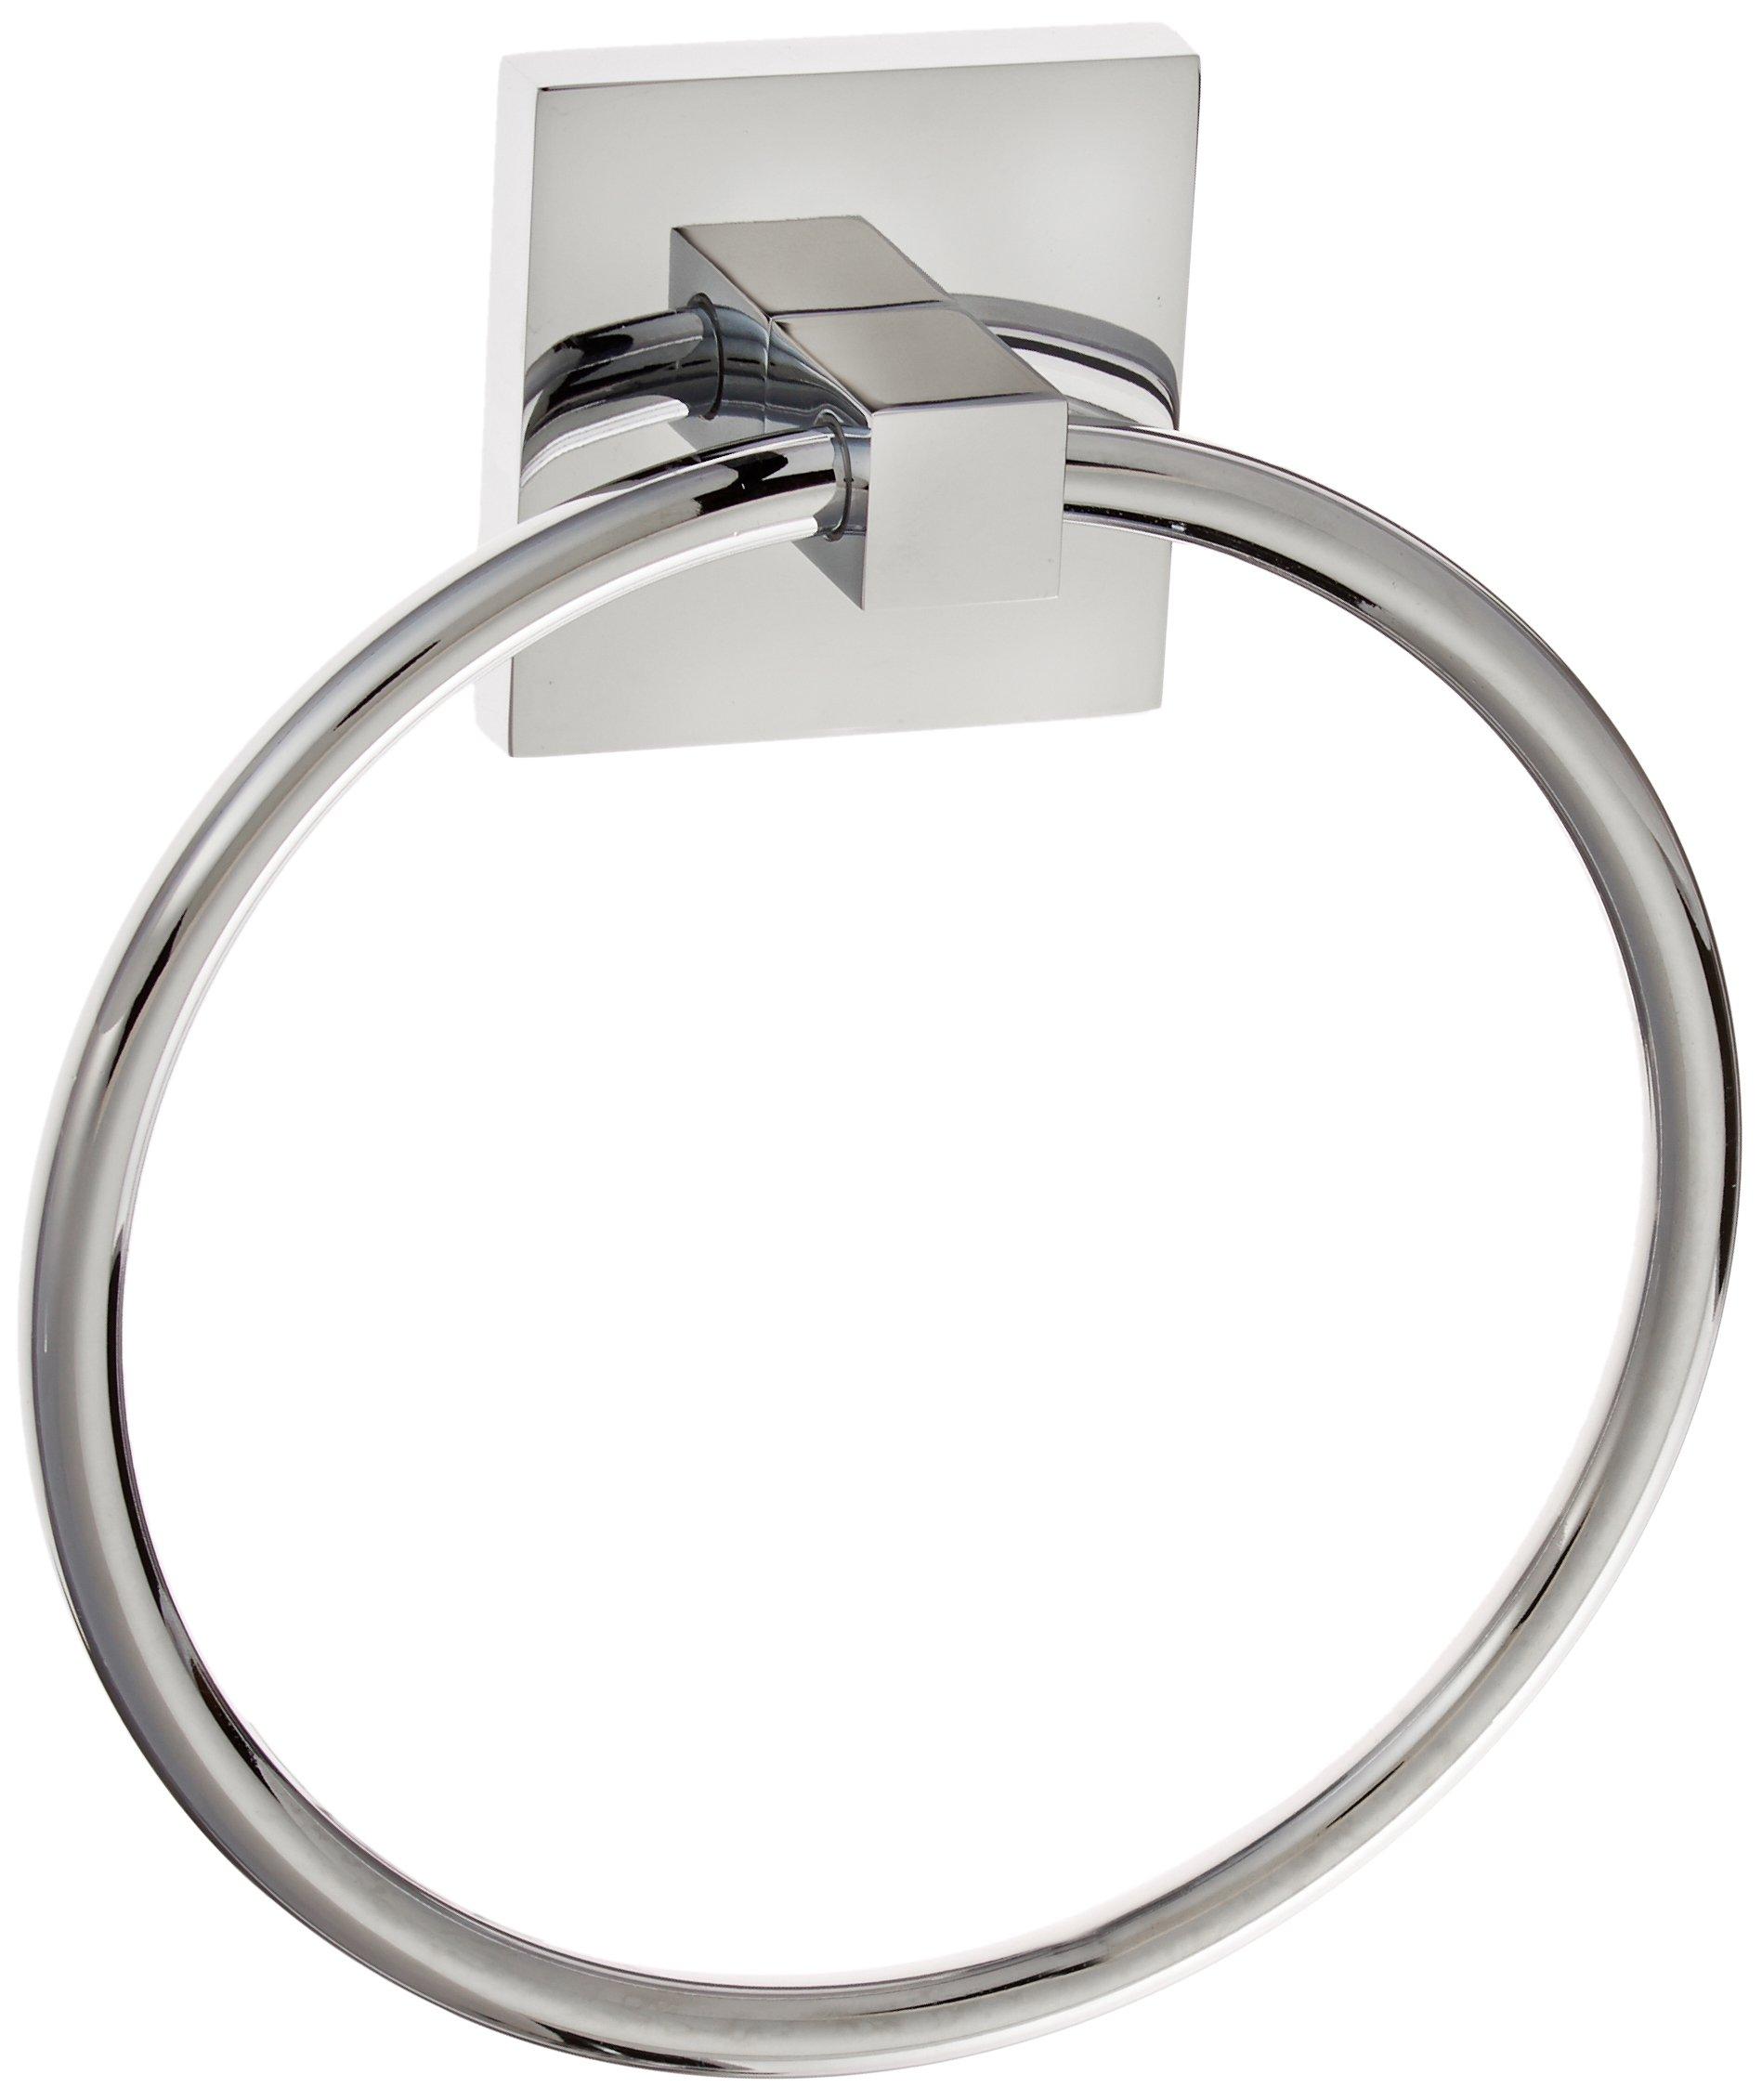 Graff G-9106-PC Contemporary Towel Ring, Polished Chrome